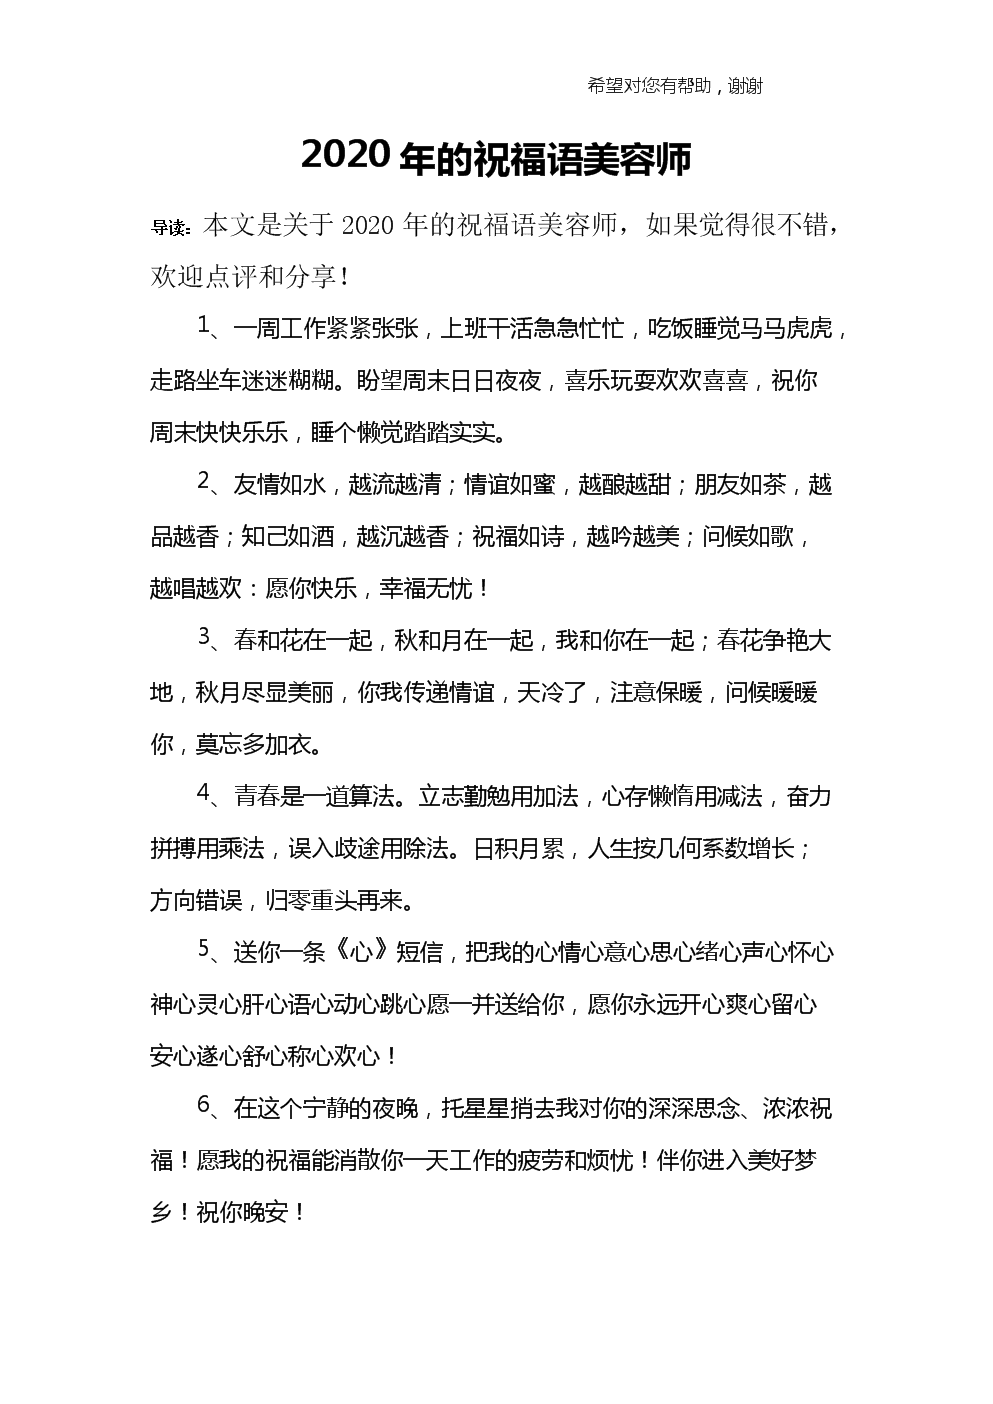 2020年的祝福语美容师.doc